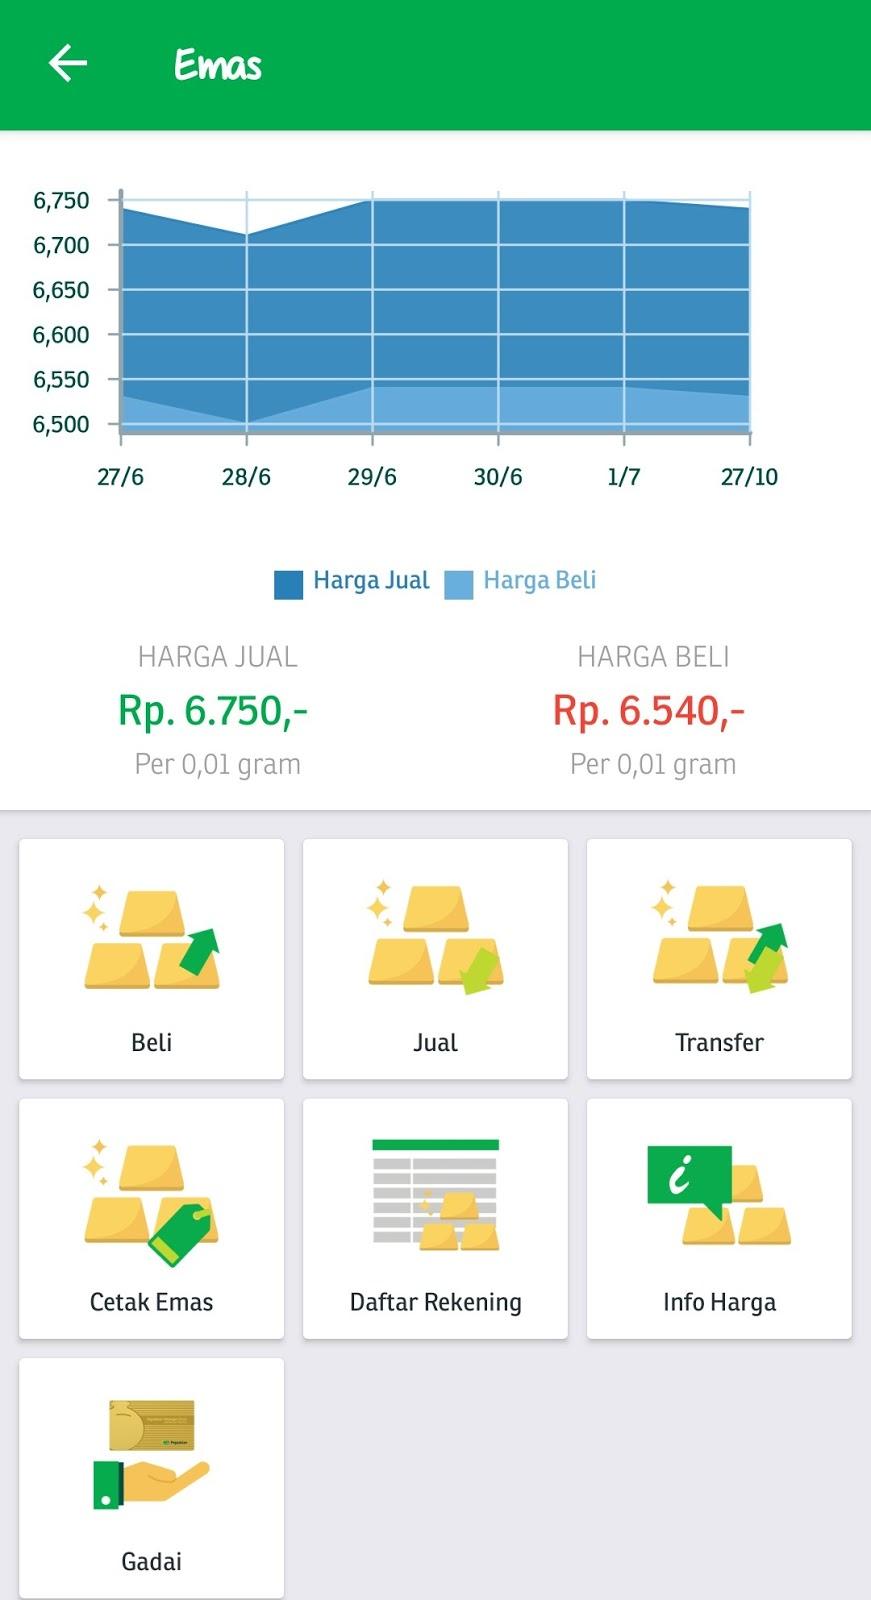 Memulai Investasi Dengan Buka Tabungan Emas Di Pegadaian Secara Online. Nggak Pakai Ribet. Yuk Simak Caranya